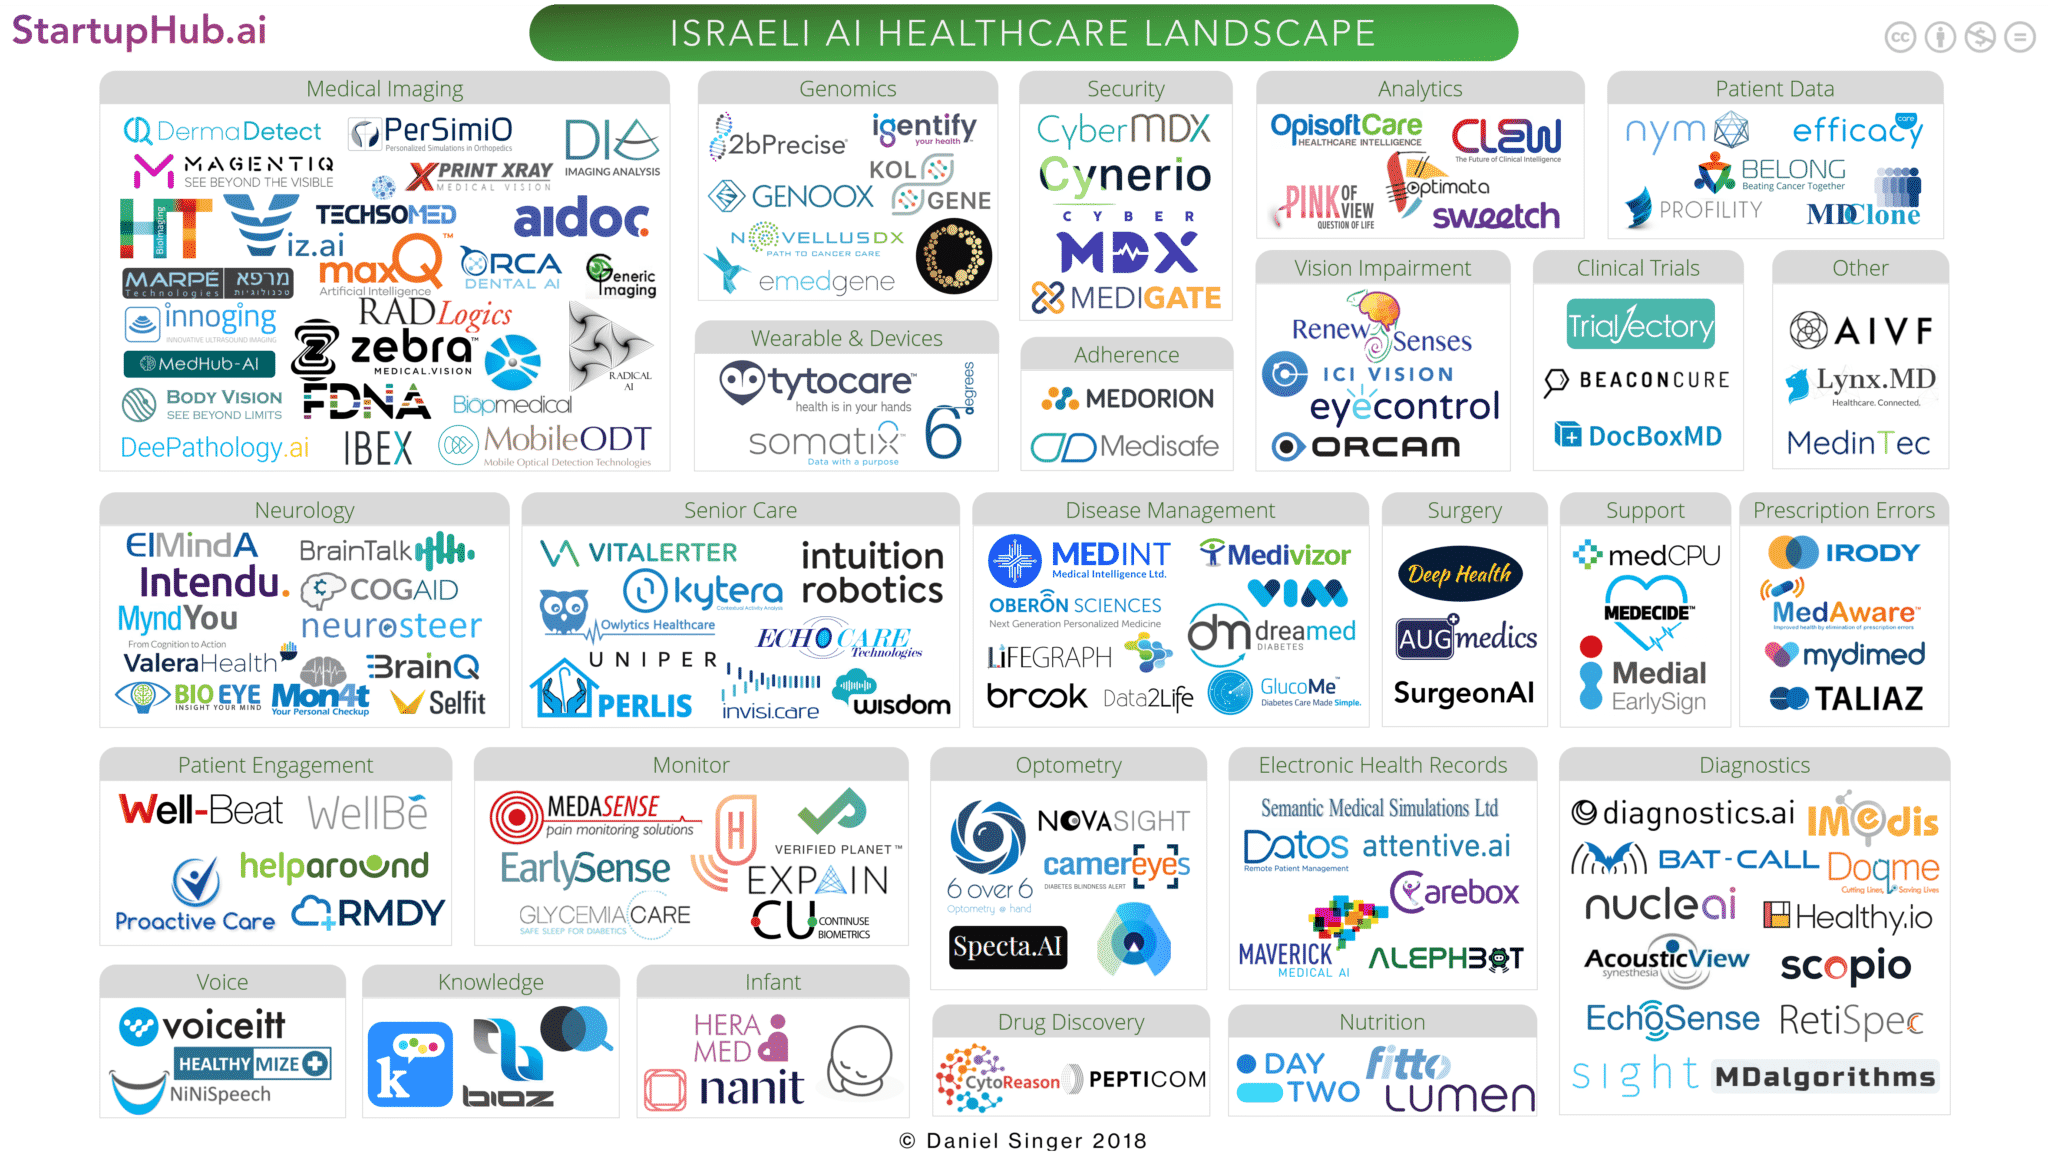 The Israeli AI Healthcare Startup Landscape of 2018